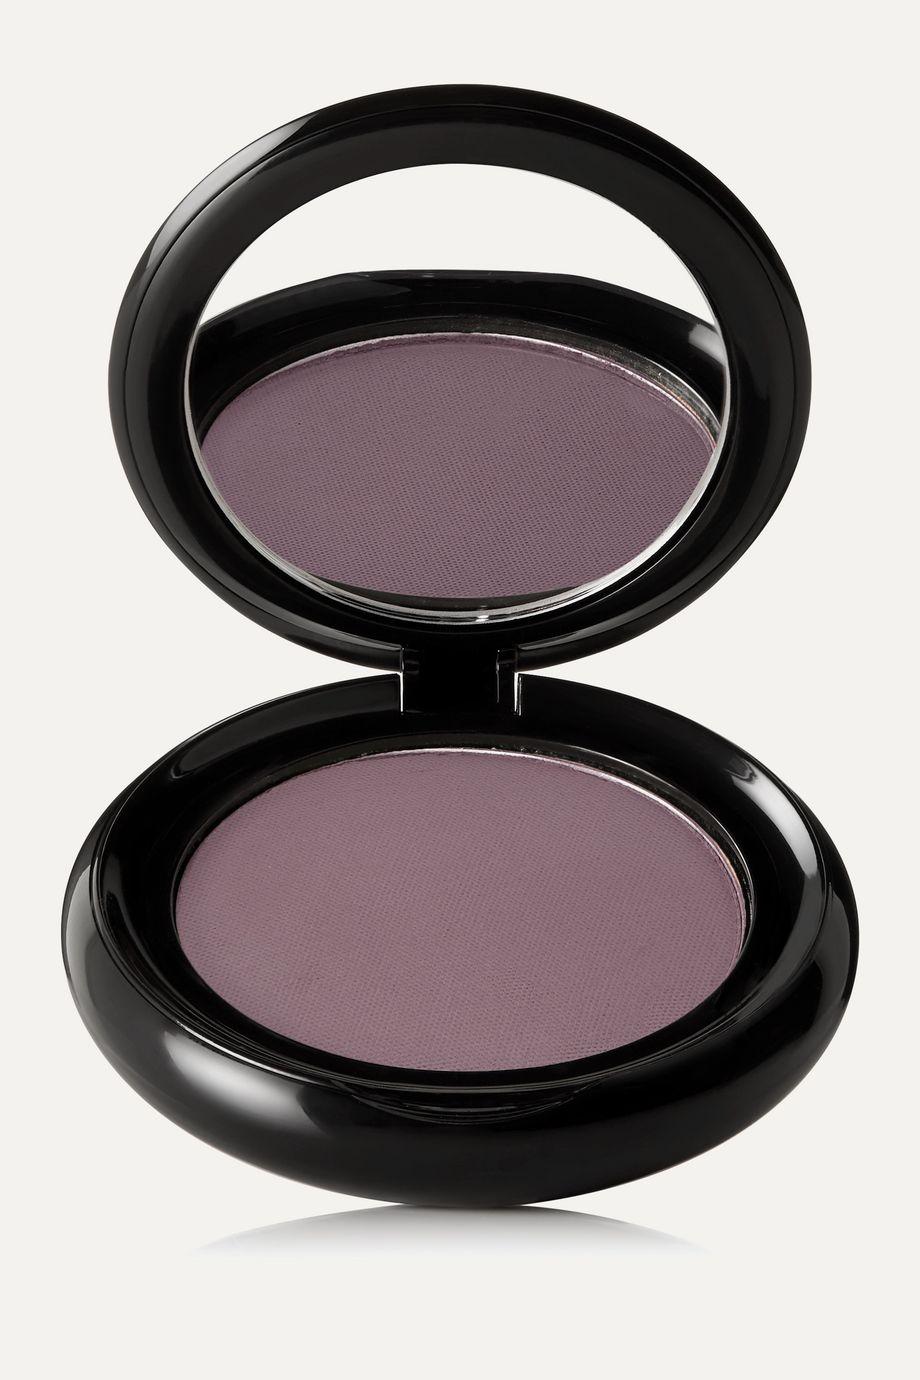 Marc Jacobs Beauty O!mega Shadow Gel Powder Eyeshadow - Moment-O! 590